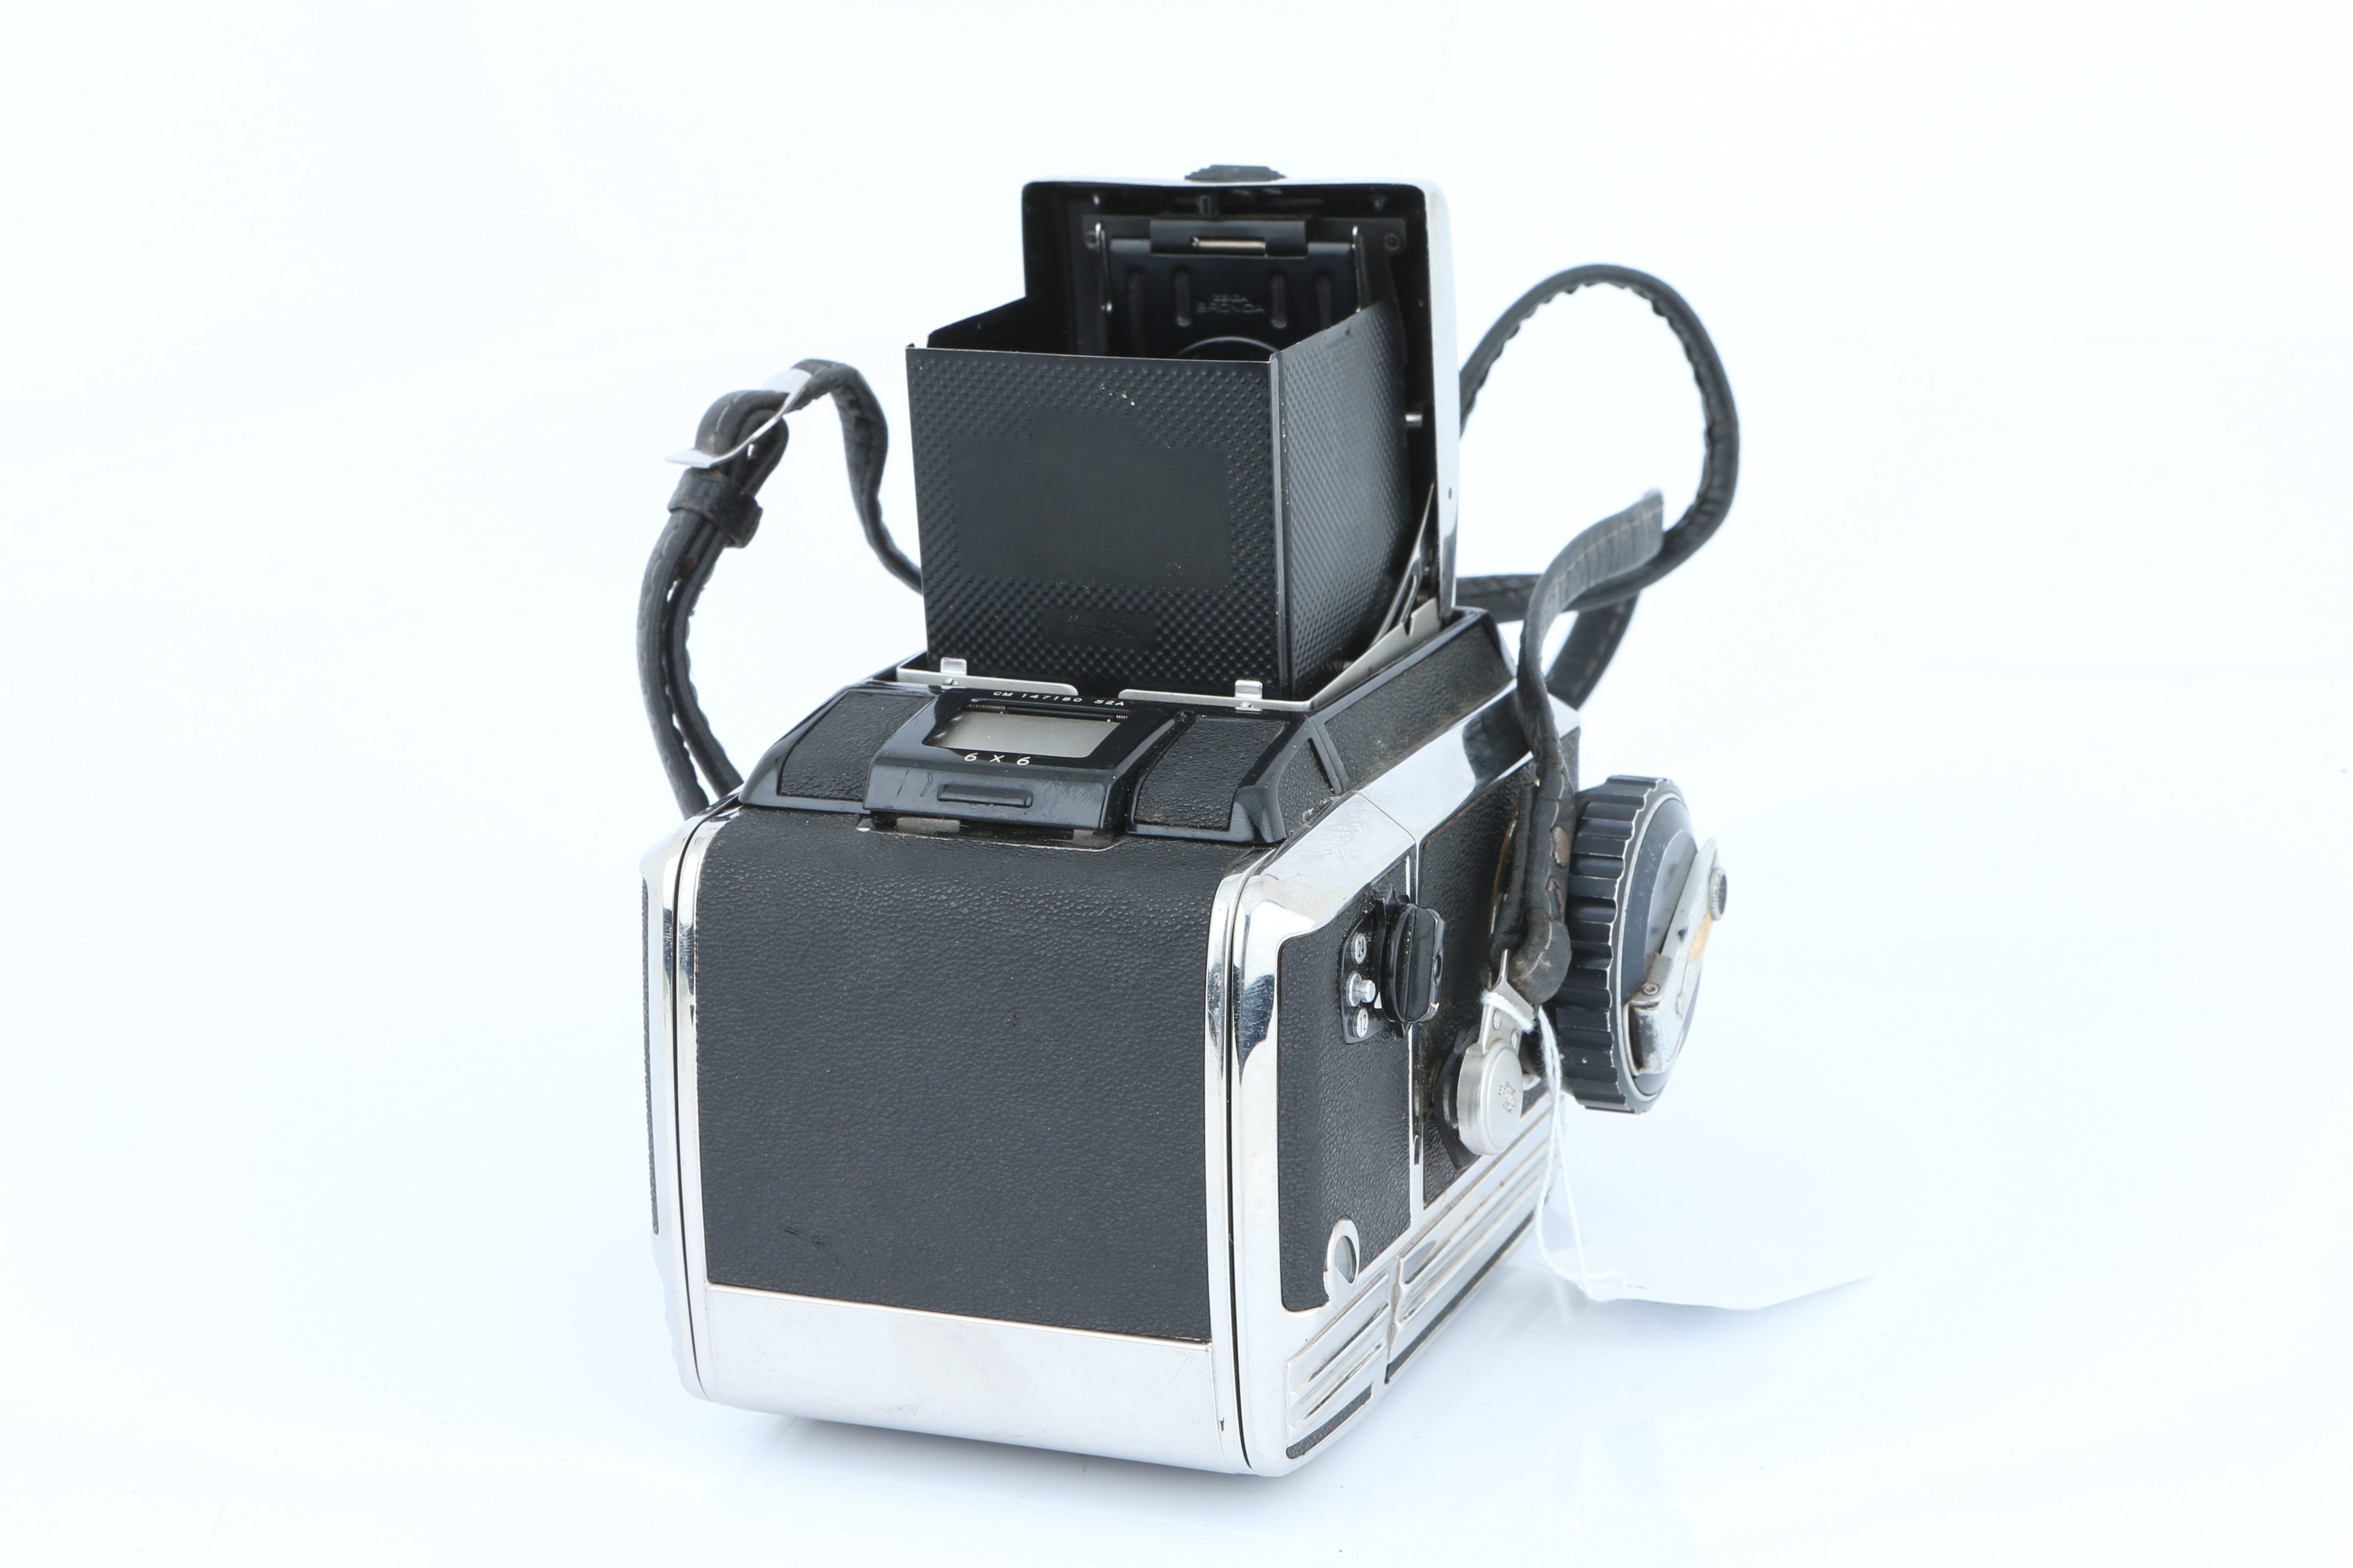 A Zenza Bronica S2A Medium Format Camera, - Image 2 of 4